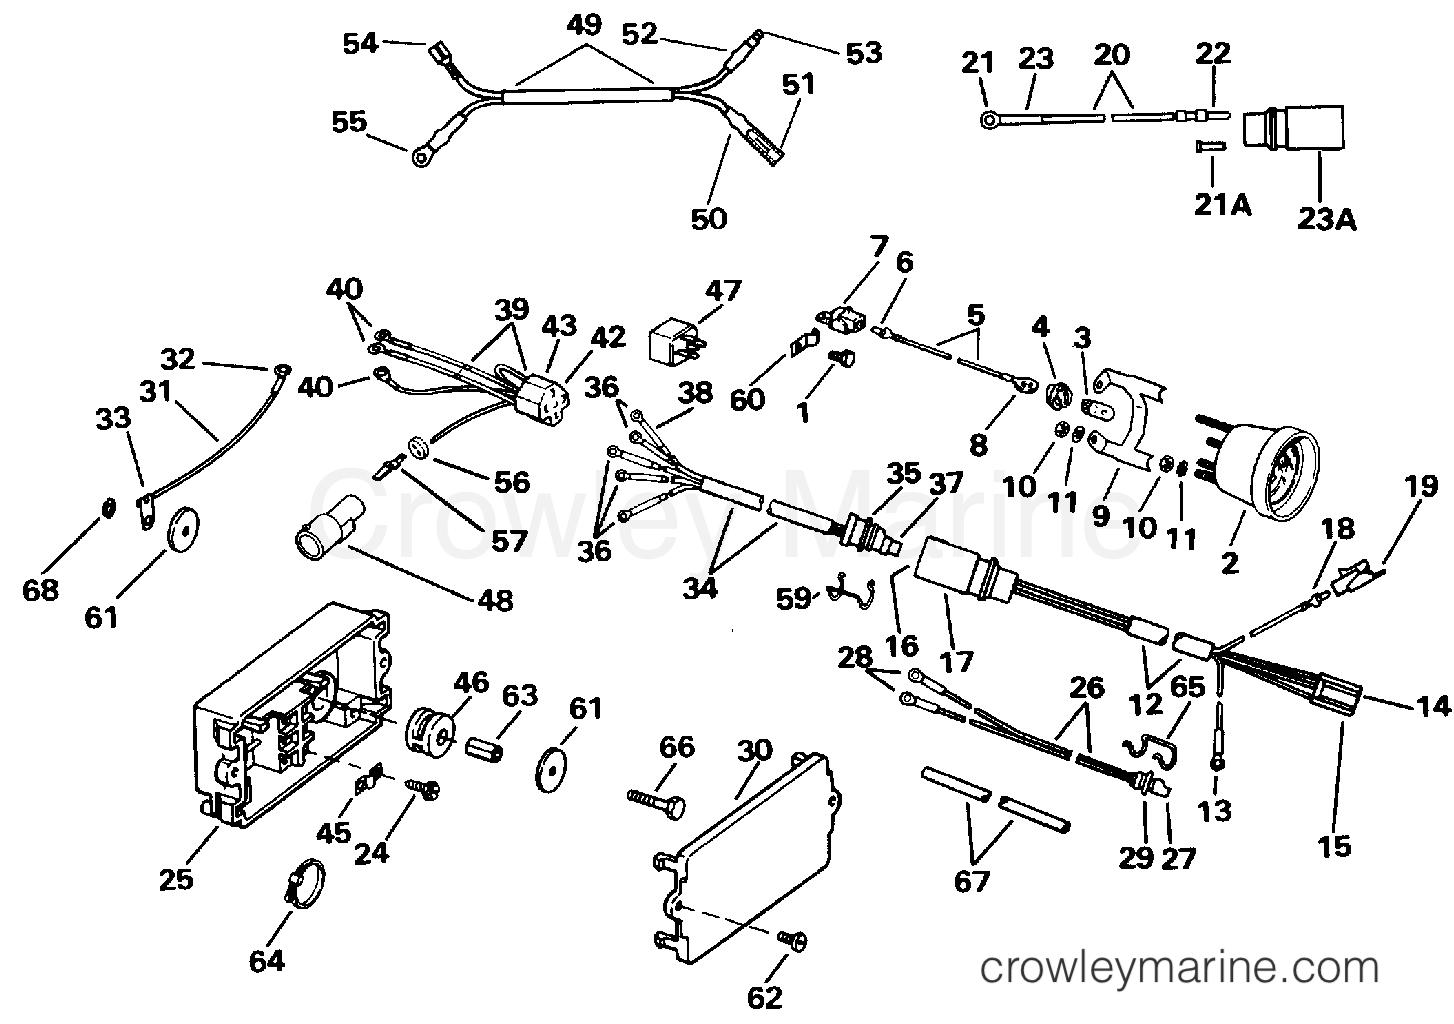 Power Trim Tilt Electrical